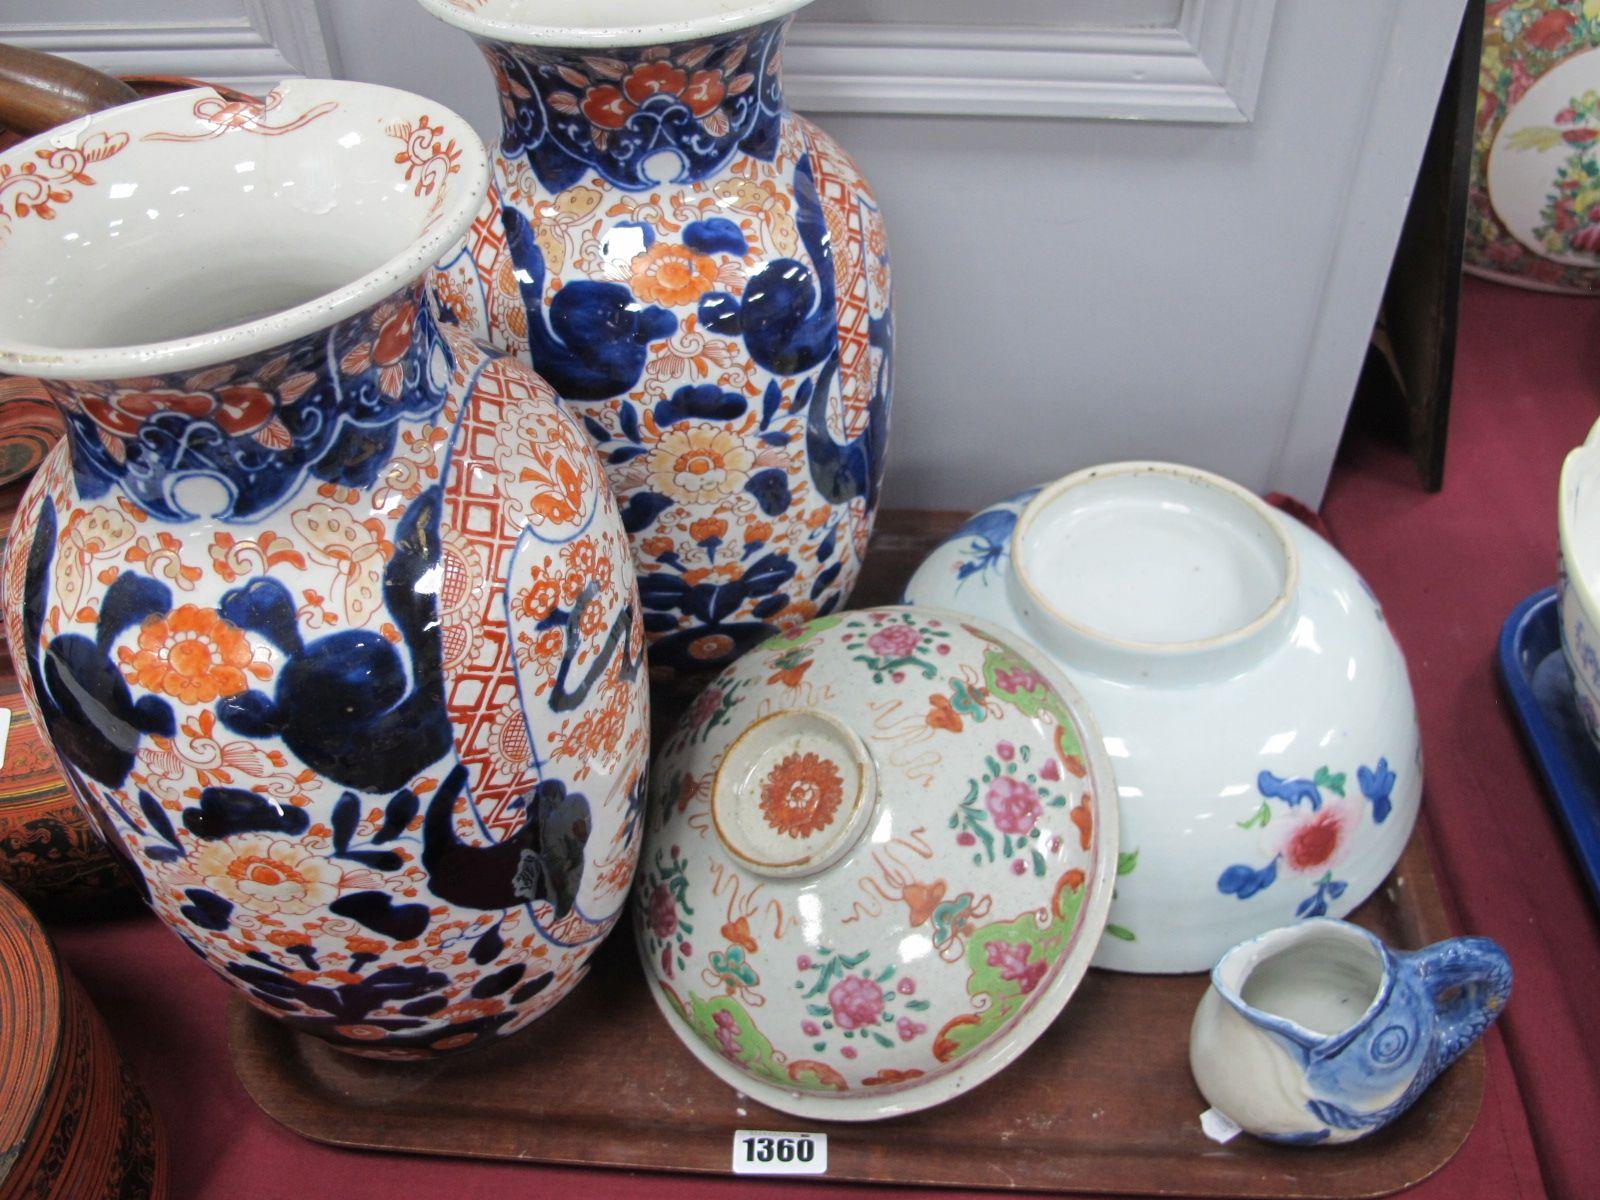 A Pair of XIX Century Imari Pottery Vases, 31cm high (damages). Chinese fruit bowl (cracked), fish